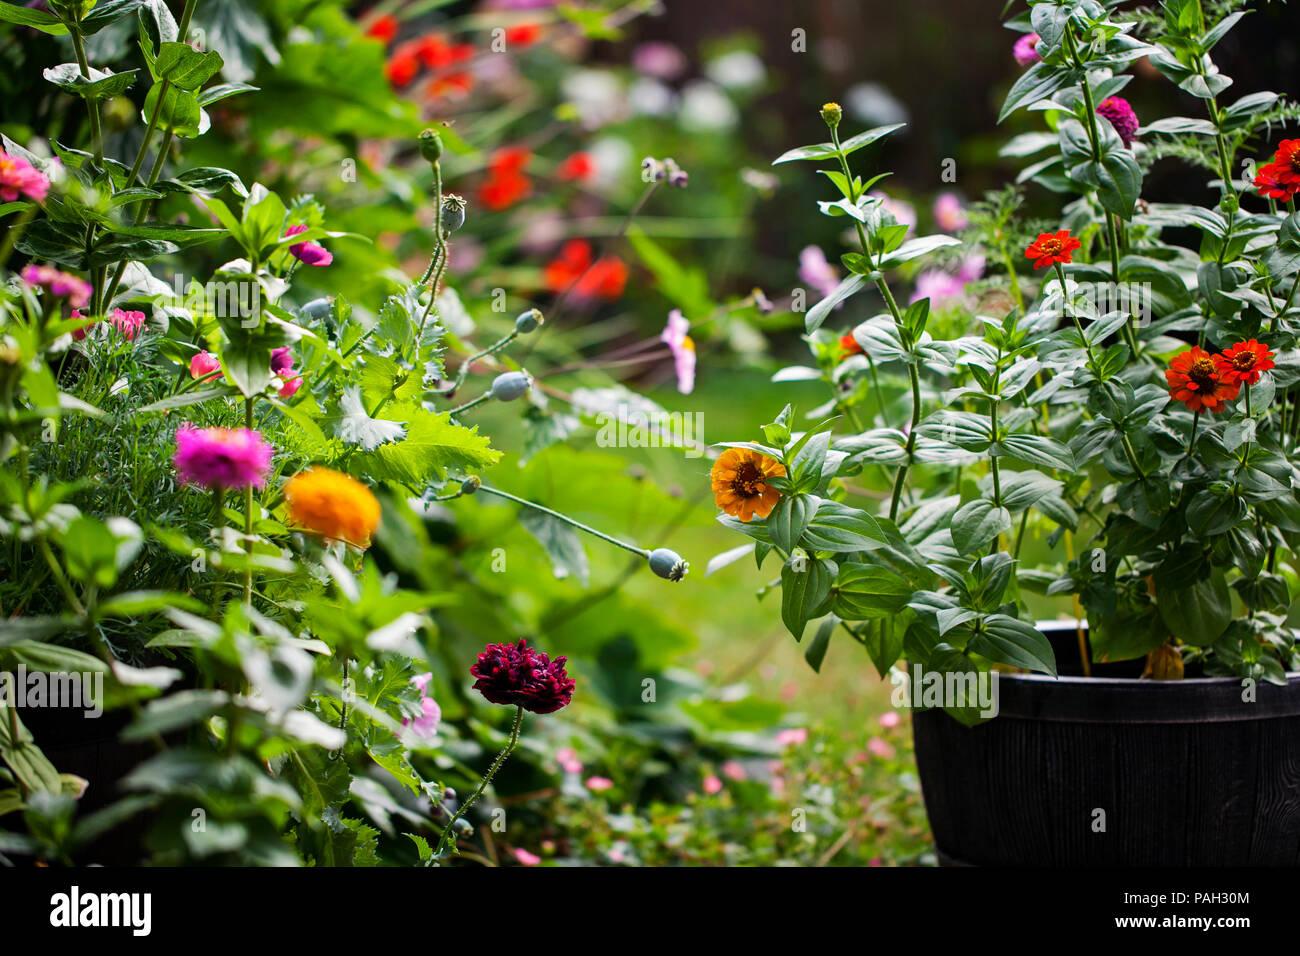 Garten im Sommer in voller Blüte Stockfoto